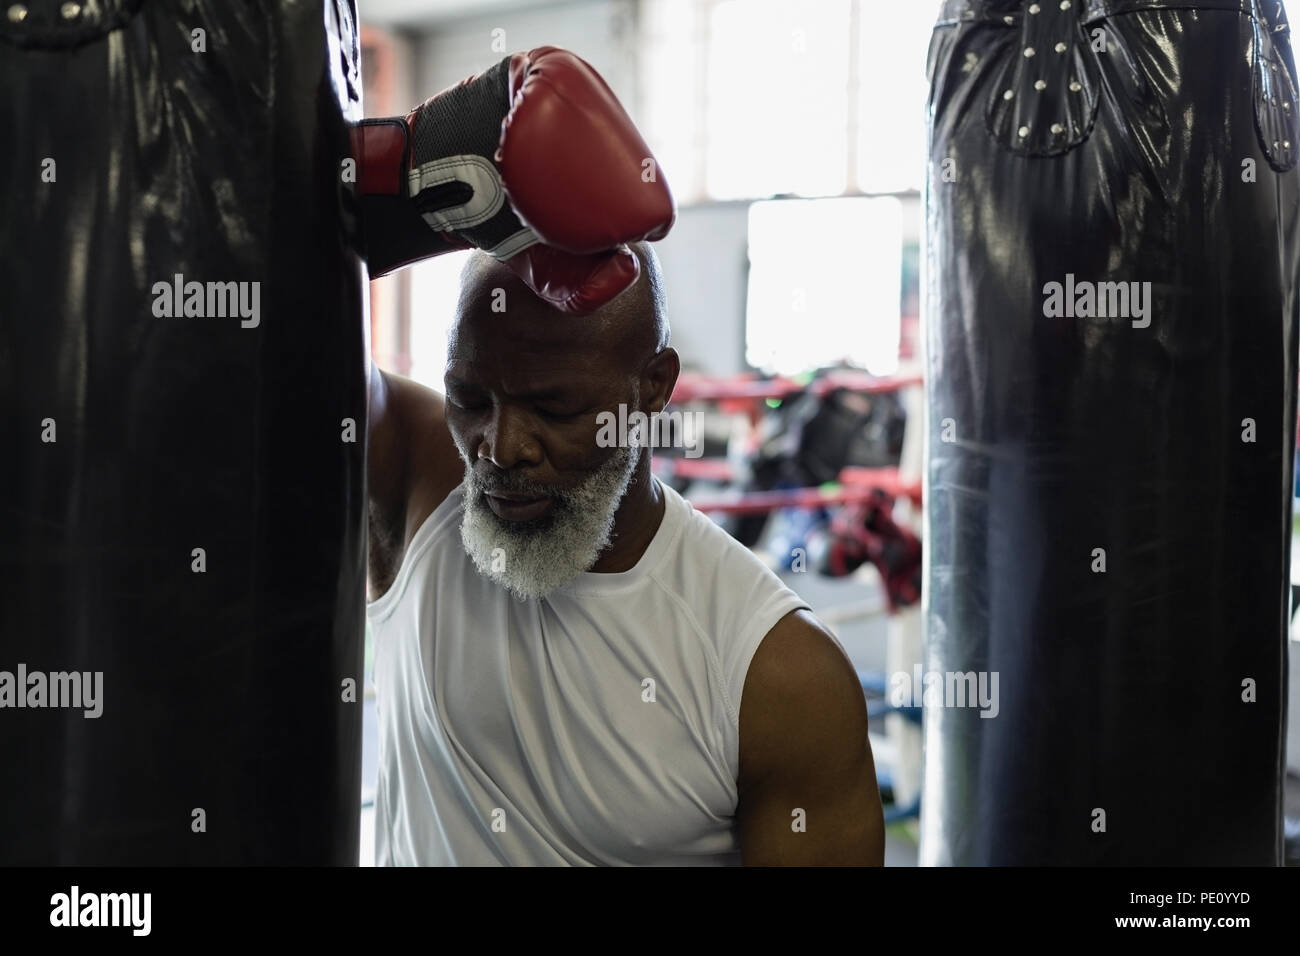 Tired senior boxer leaning against the punching bag - Stock Image